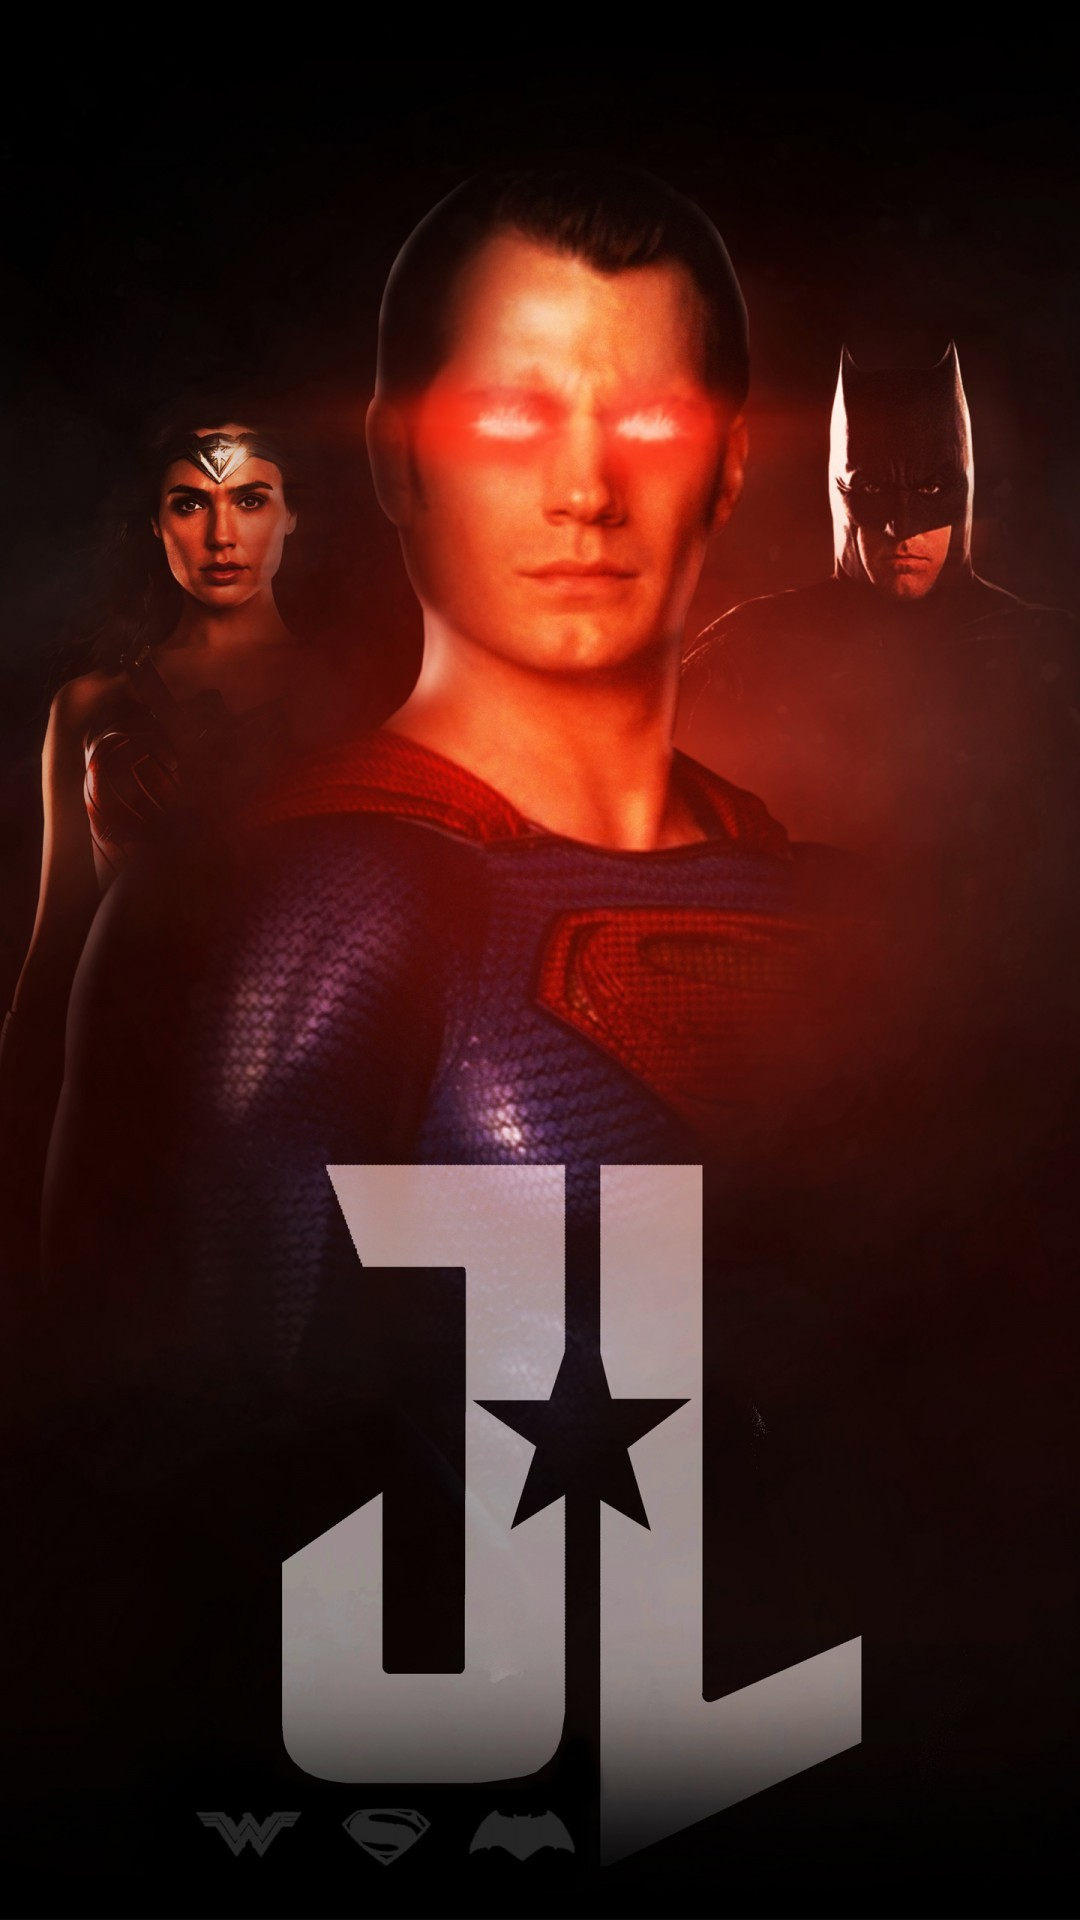 Free Justice League Wonder Woman Superman Batman phone wallpaper by lilb320